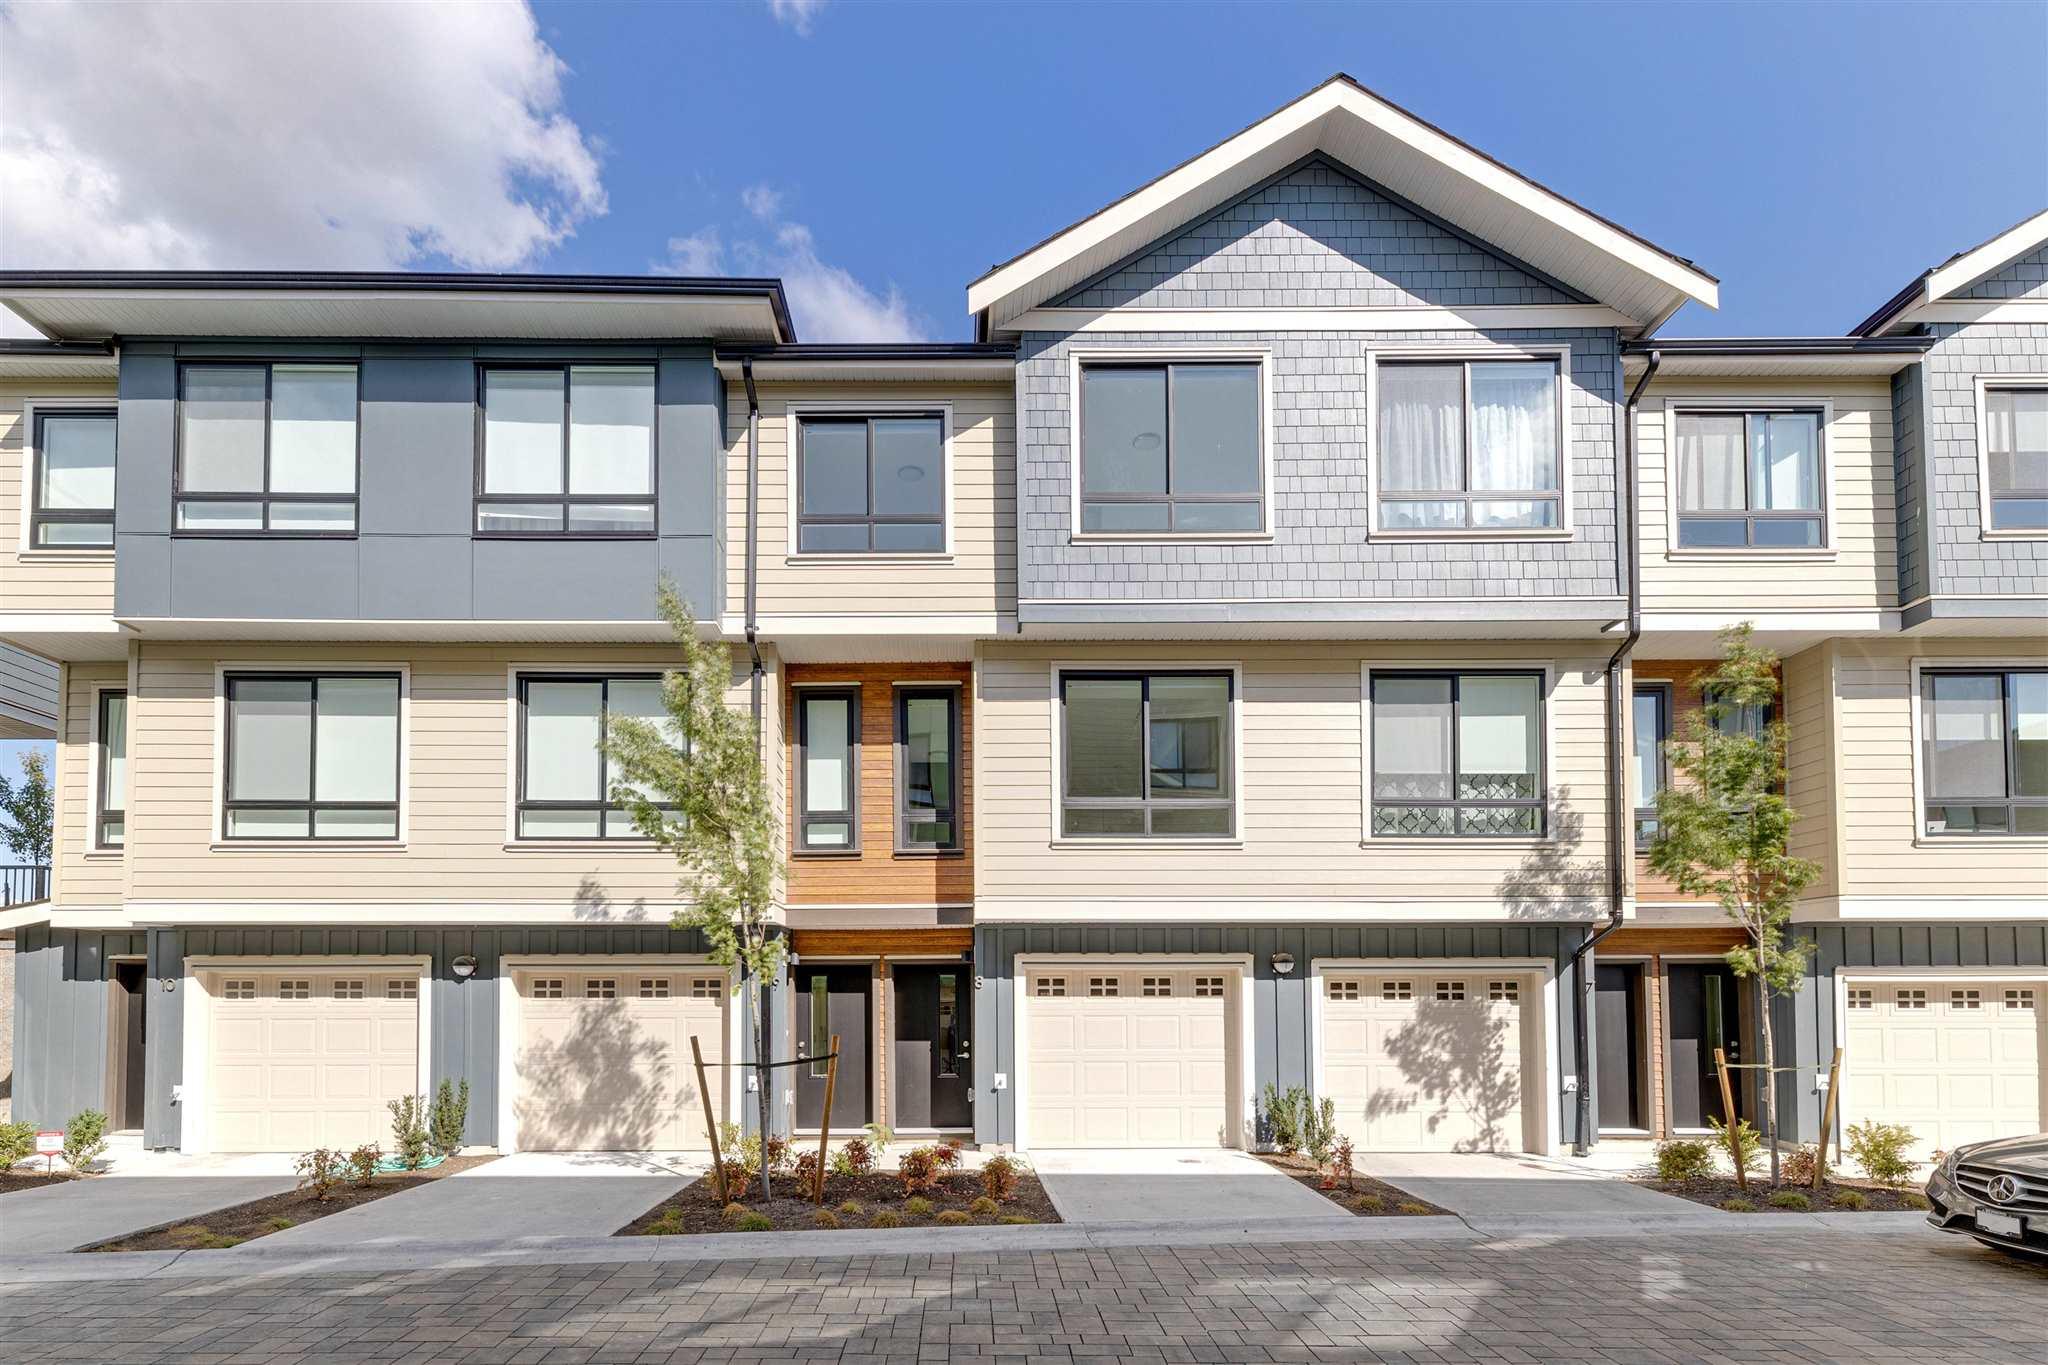 8 10233 RIVER DRIVE - Bridgeport RI Townhouse for sale, 3 Bedrooms (R2605450)